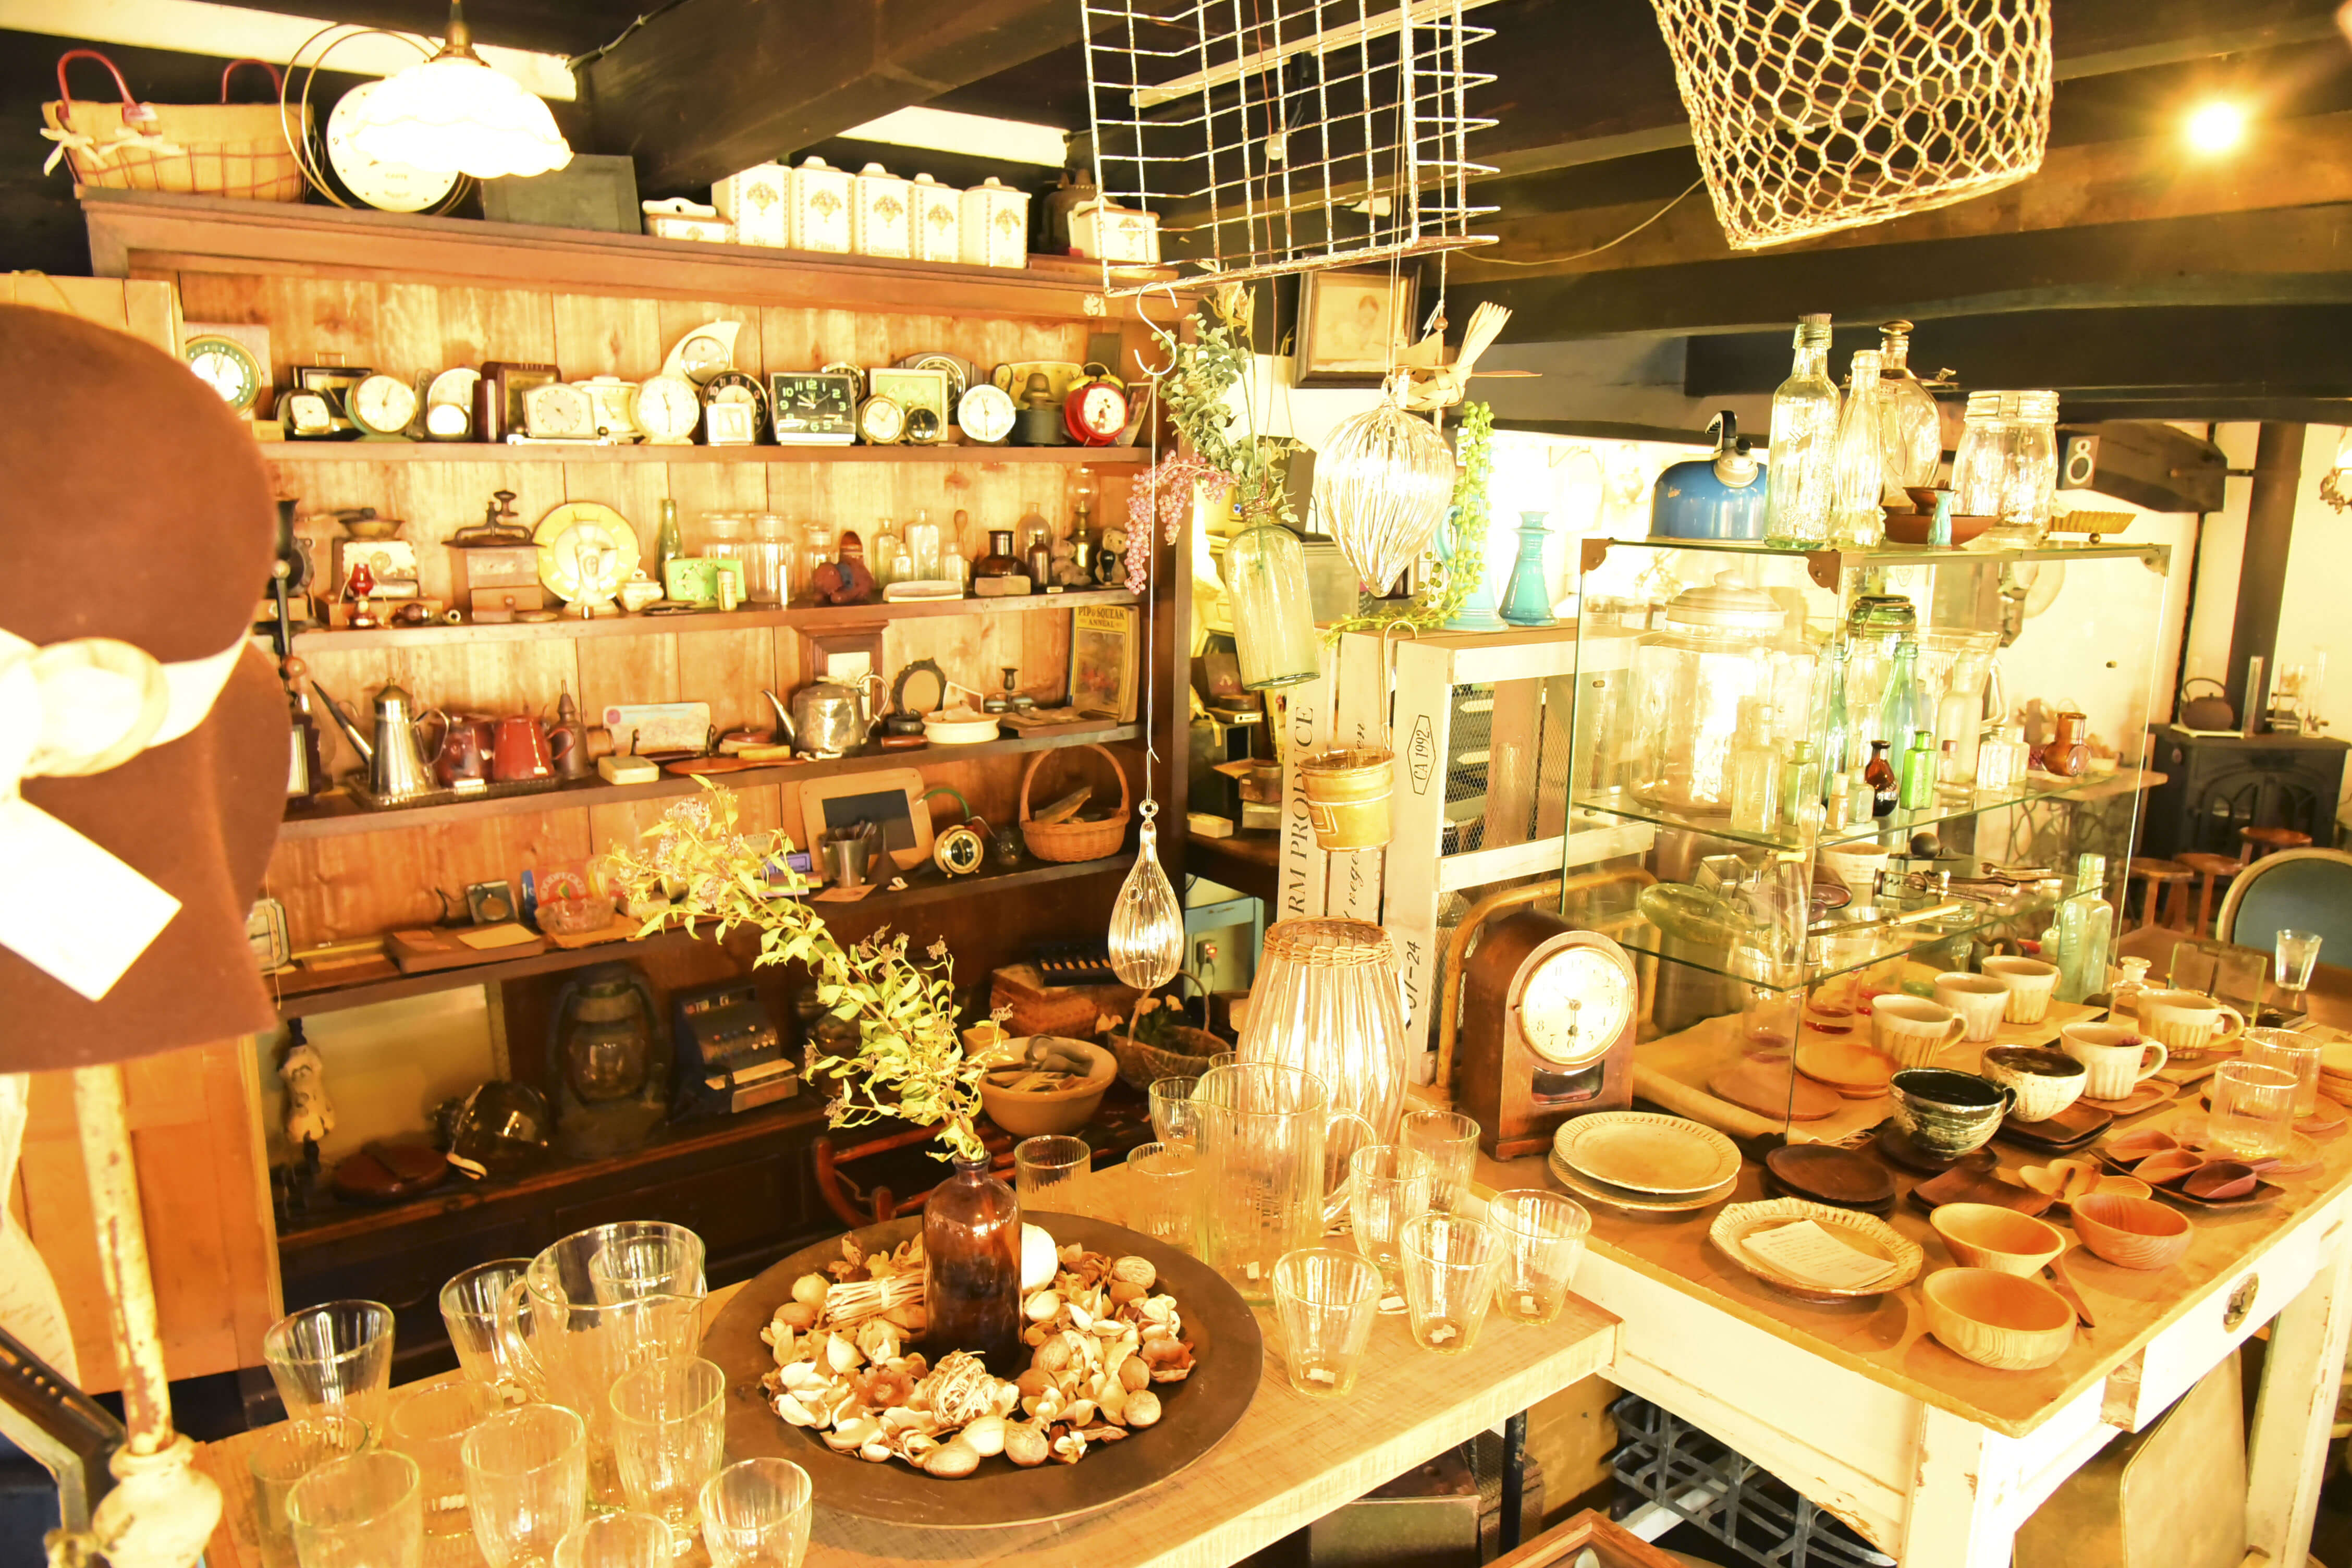 【KOKOPELLI(ココペリ)】熊本市西区の古民家カフェ。おしゃれな店内と素敵なお庭が広がる隠れ家。